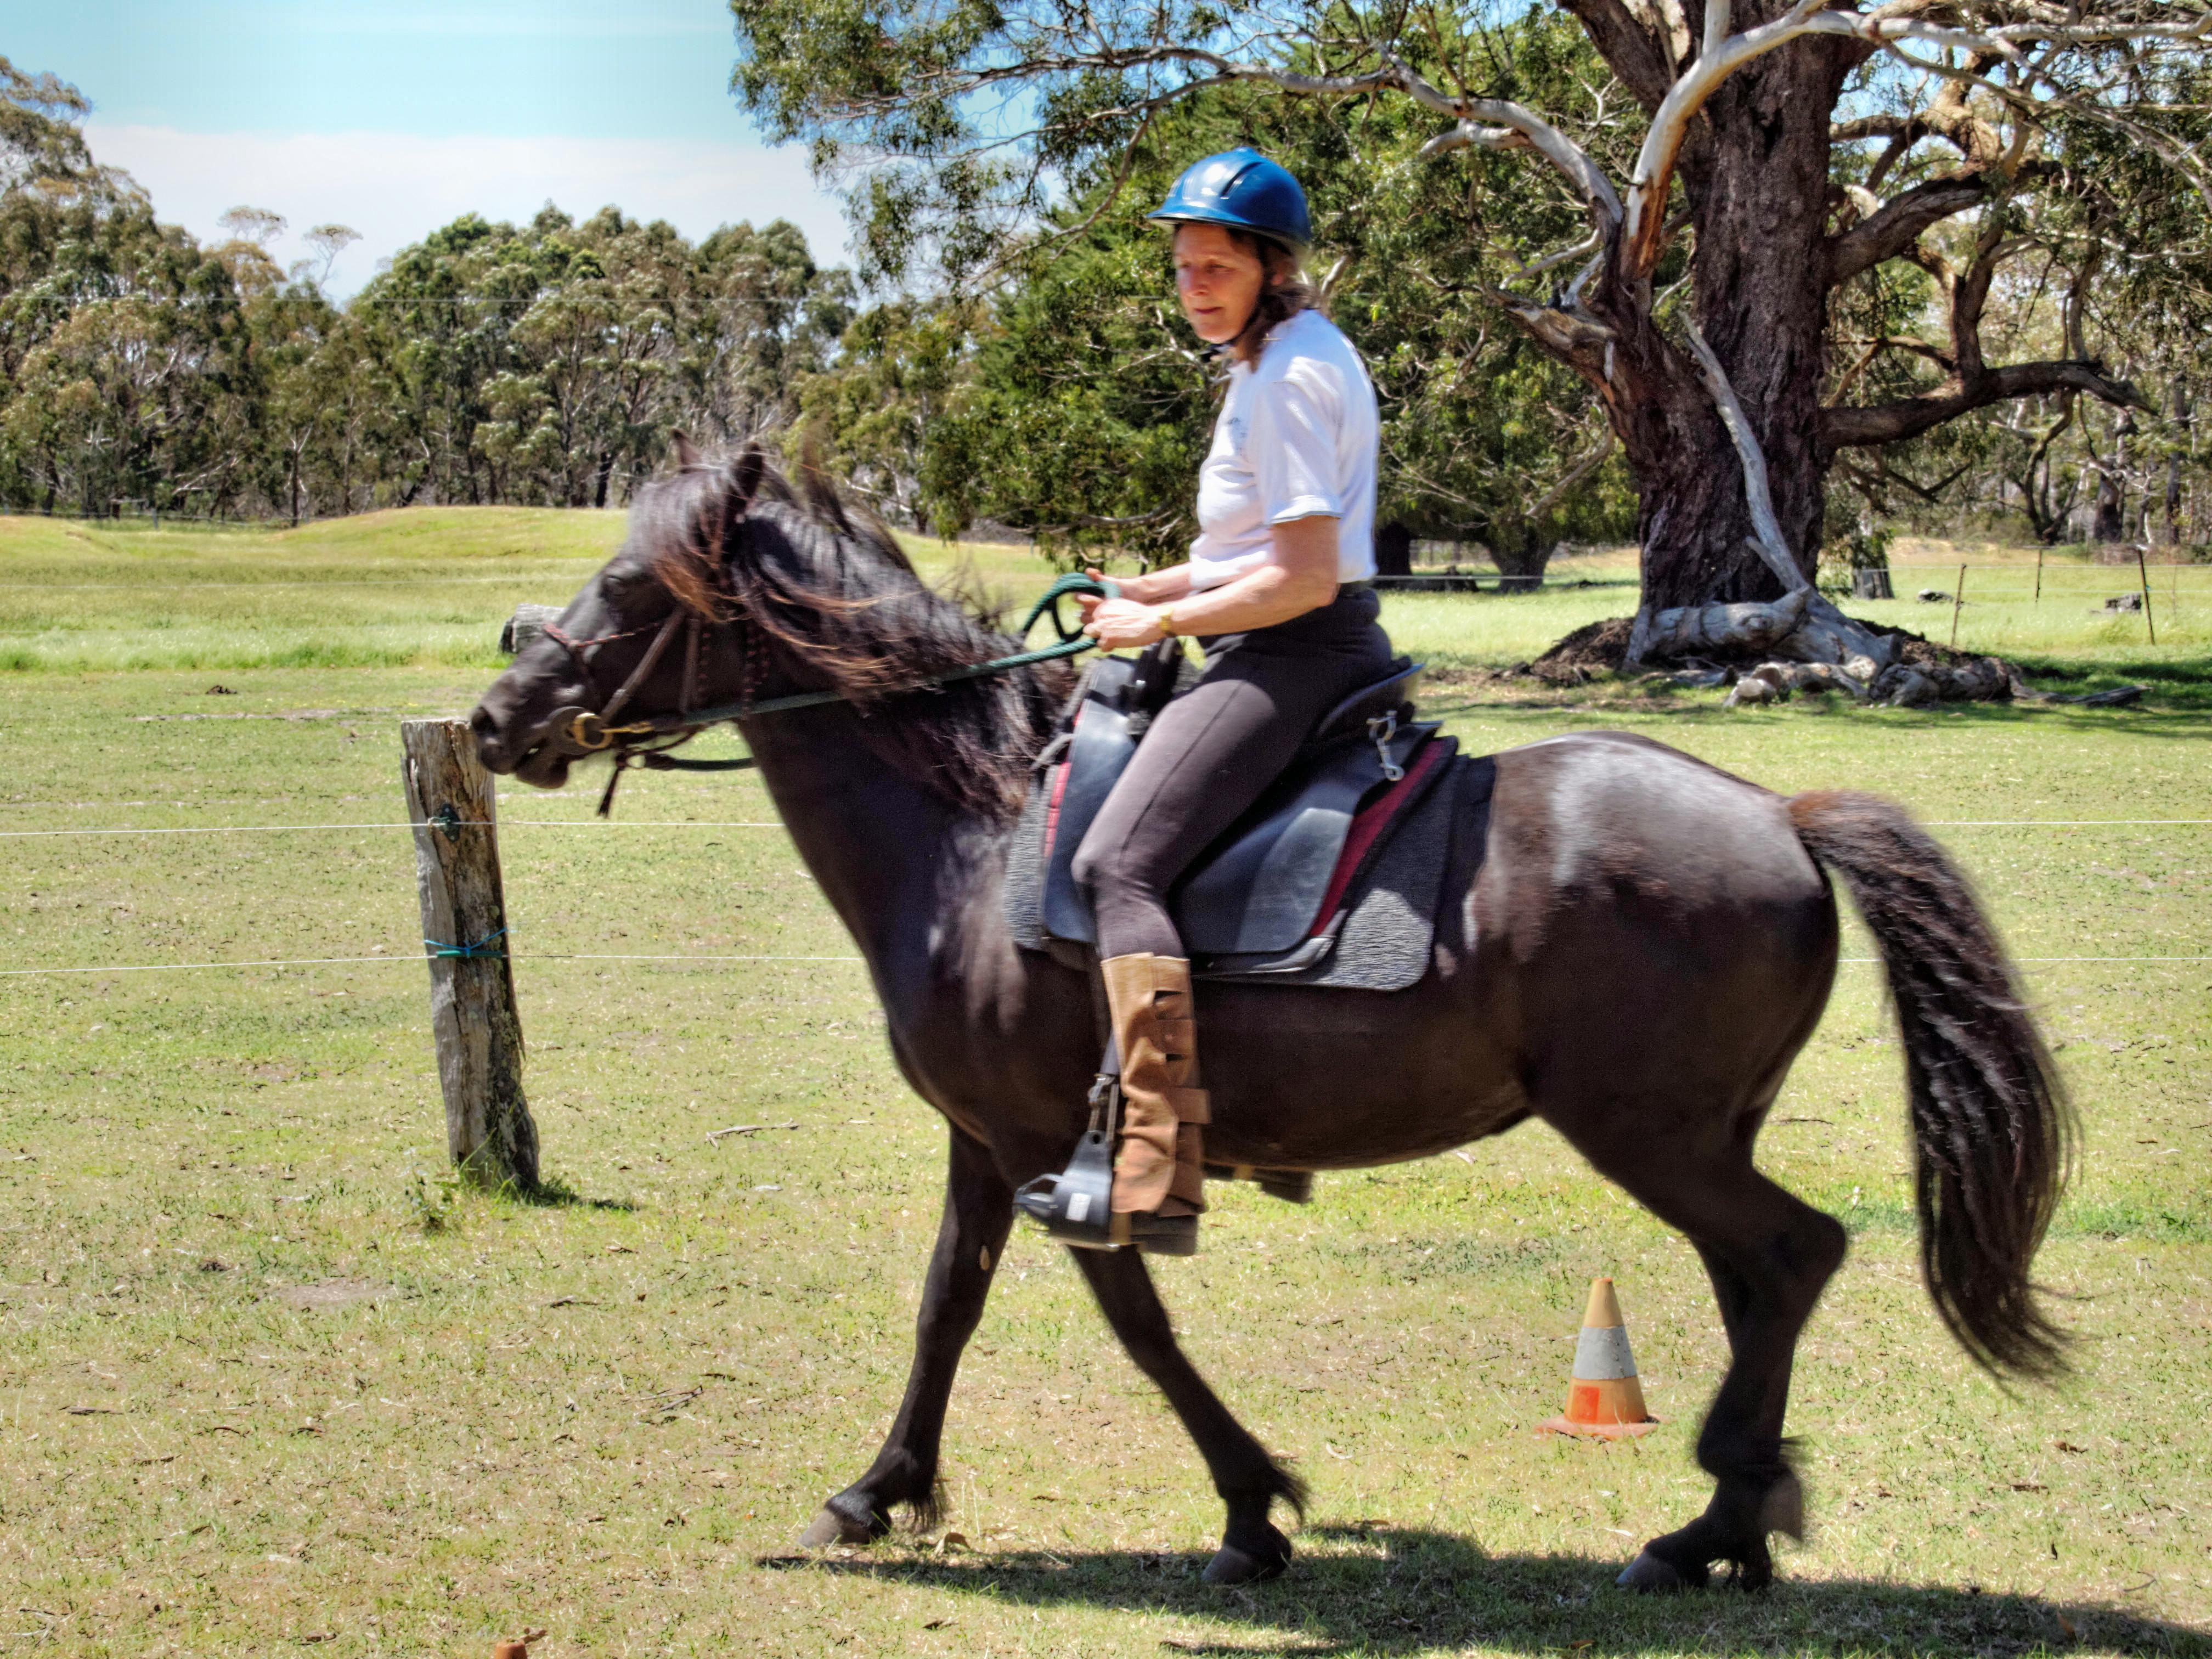 Riding-8.jpeg